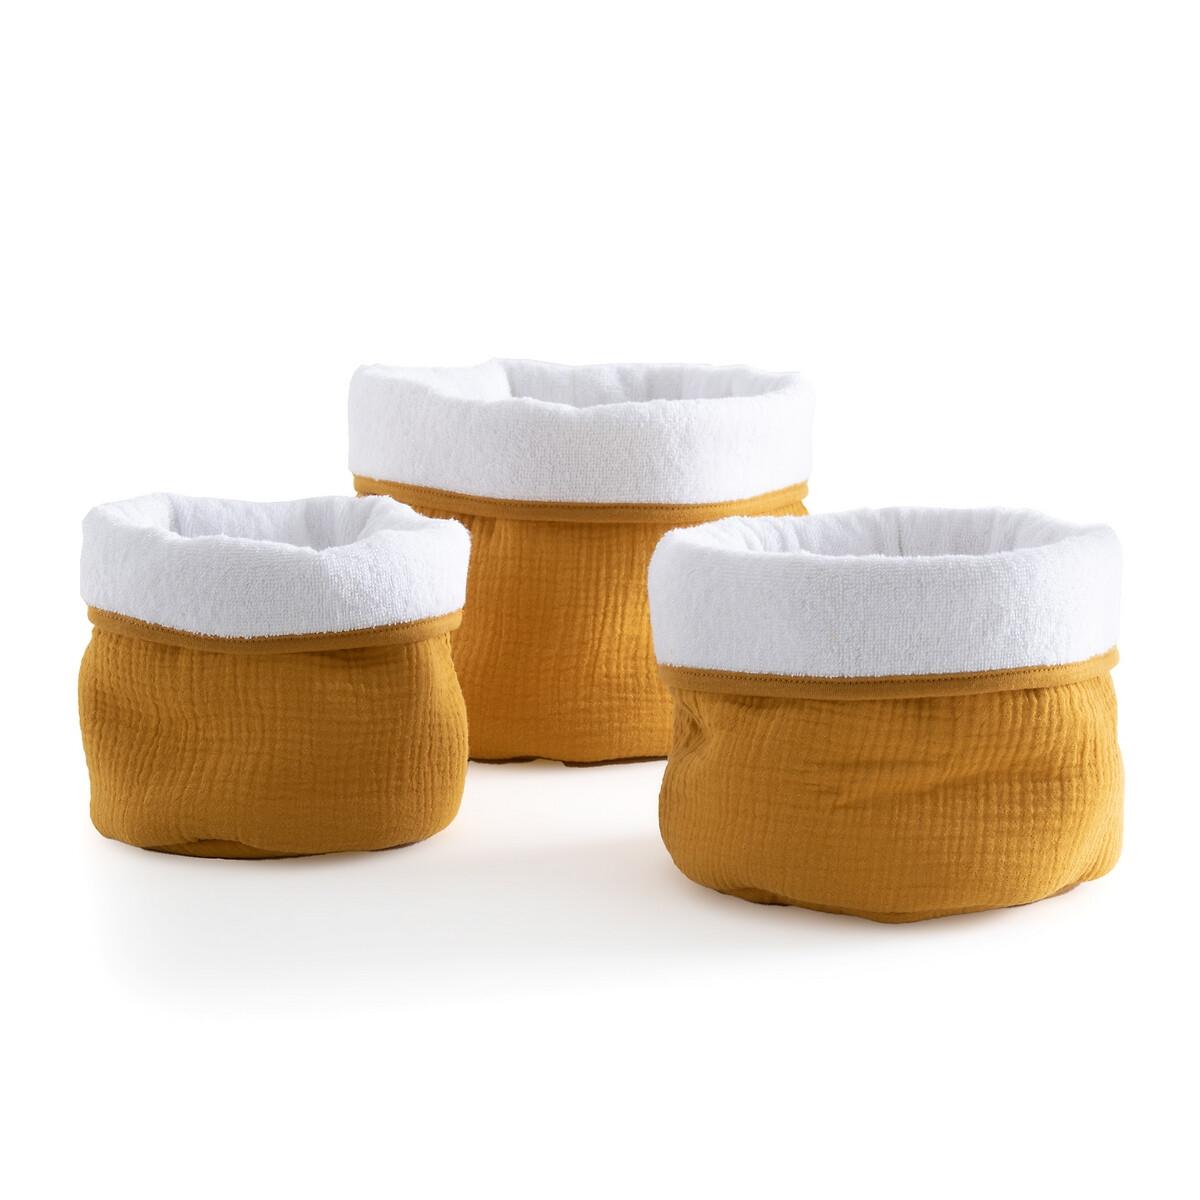 Комплект из 3 корзин из LaRedoute Хлопчатобумажной газовой ткани Kumla единый размер желтый